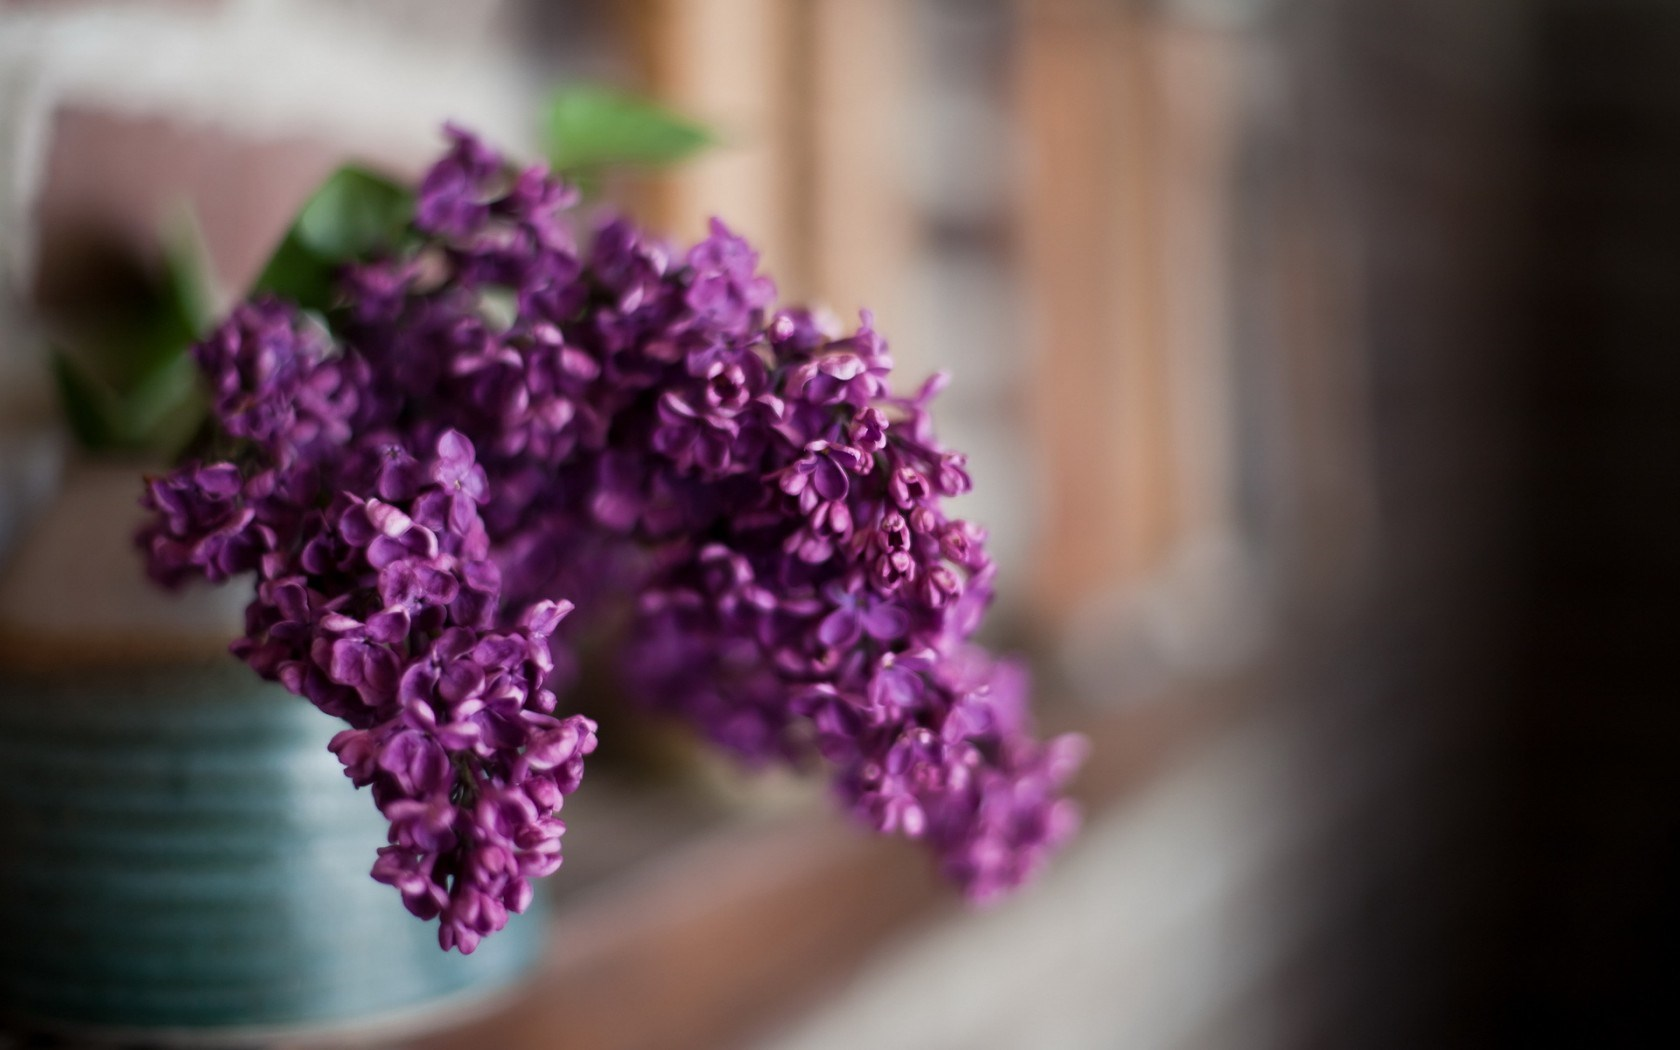 Lilac Flowers Macro Close-Up